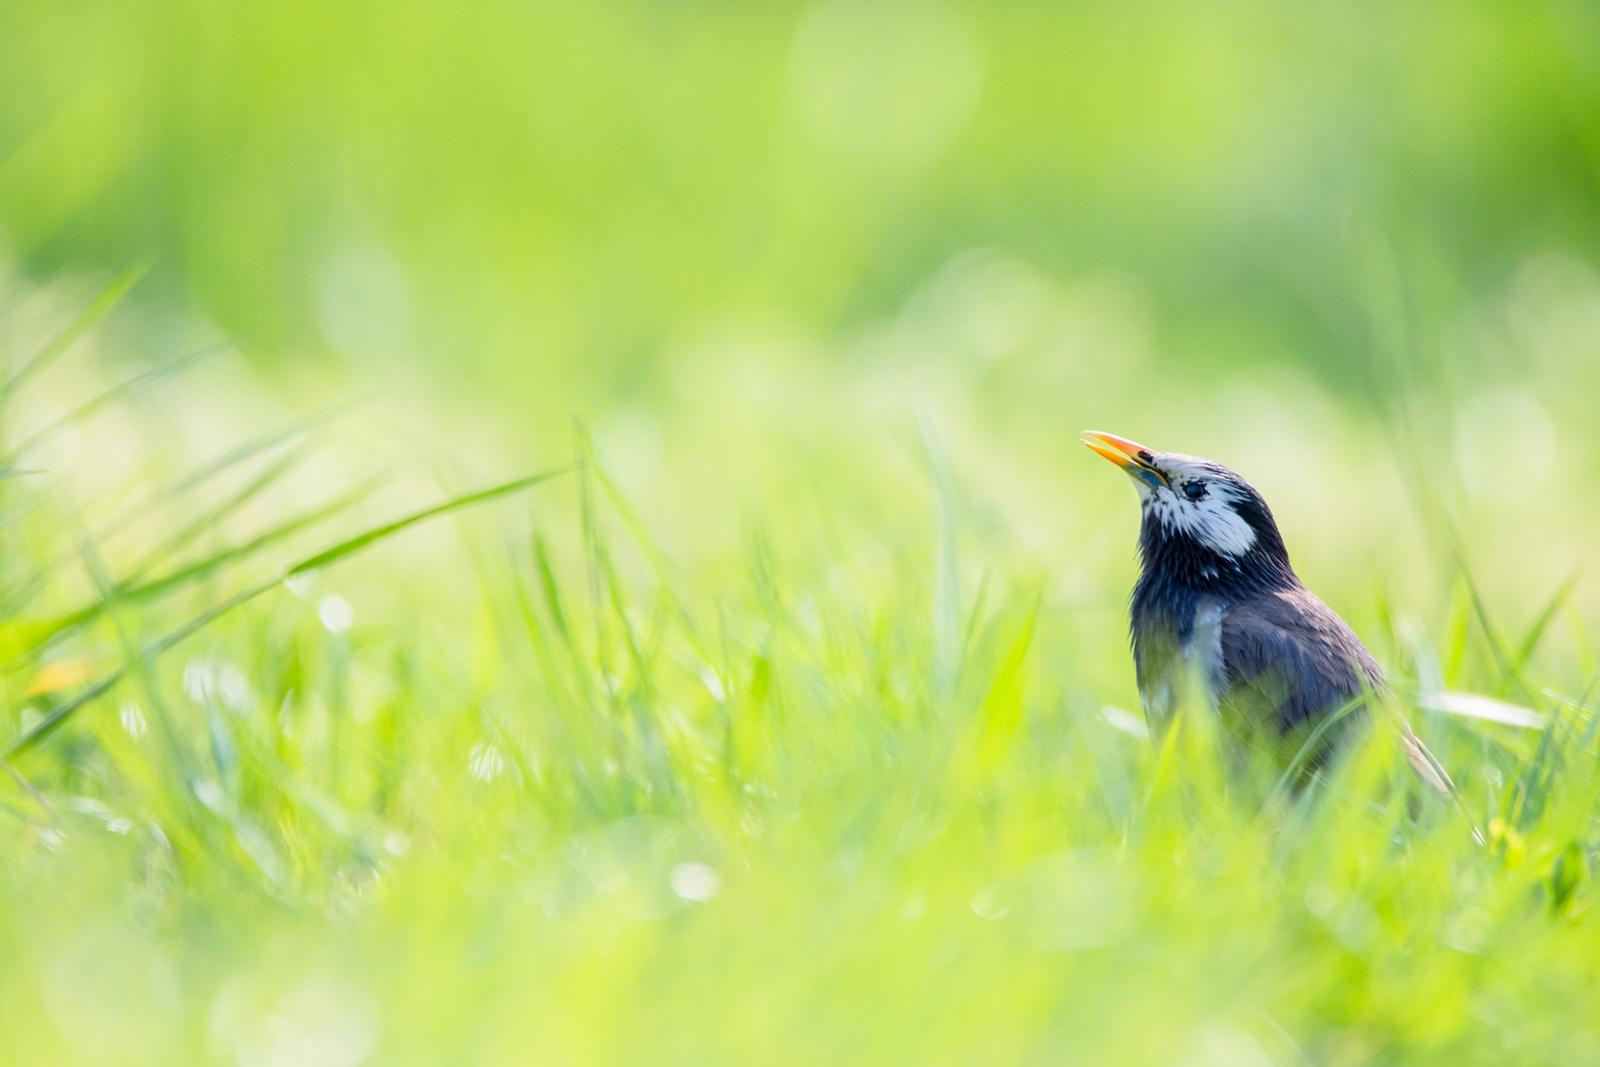 Photo: 「ぐんぐん伸びる」 / Growing green.  見る見るうちに生い茂る ぐんぐん伸びて 世界を染める 緑の季節がやってきた  White-cheeked Starling. (ムクドリ)  Nikon D7200 SIGMA 150-600mm F5-6.3 DG OS HSM Contemporary  #birdphotography #birds #kawaii #ことり #小鳥 #nikon #sigma  ( http://takafumiooshio.com/archives/2448 )